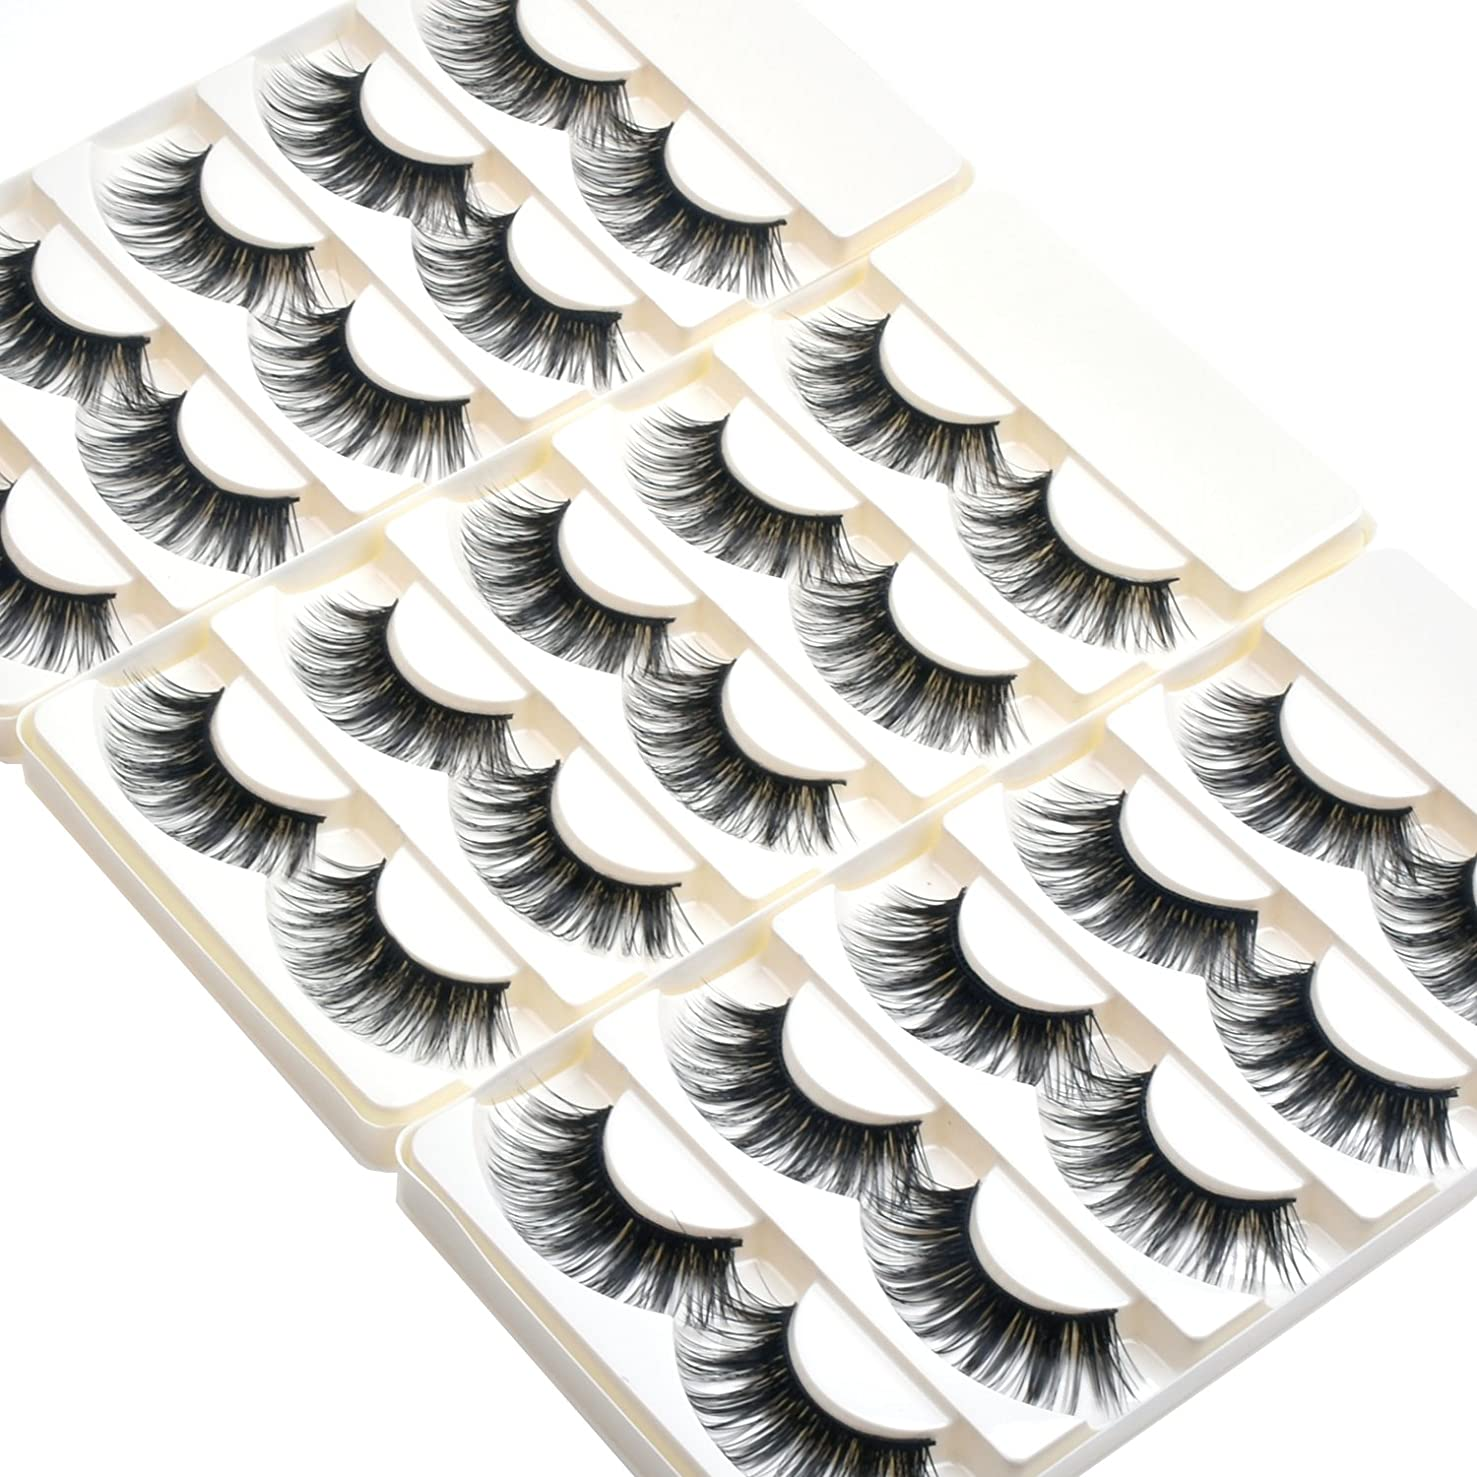 Wleec Beauty Dramatic Eyelashes Set Long Strip Lashes Handmade False Eyelash Pack #27/L (15 Pairs/3 Pack)